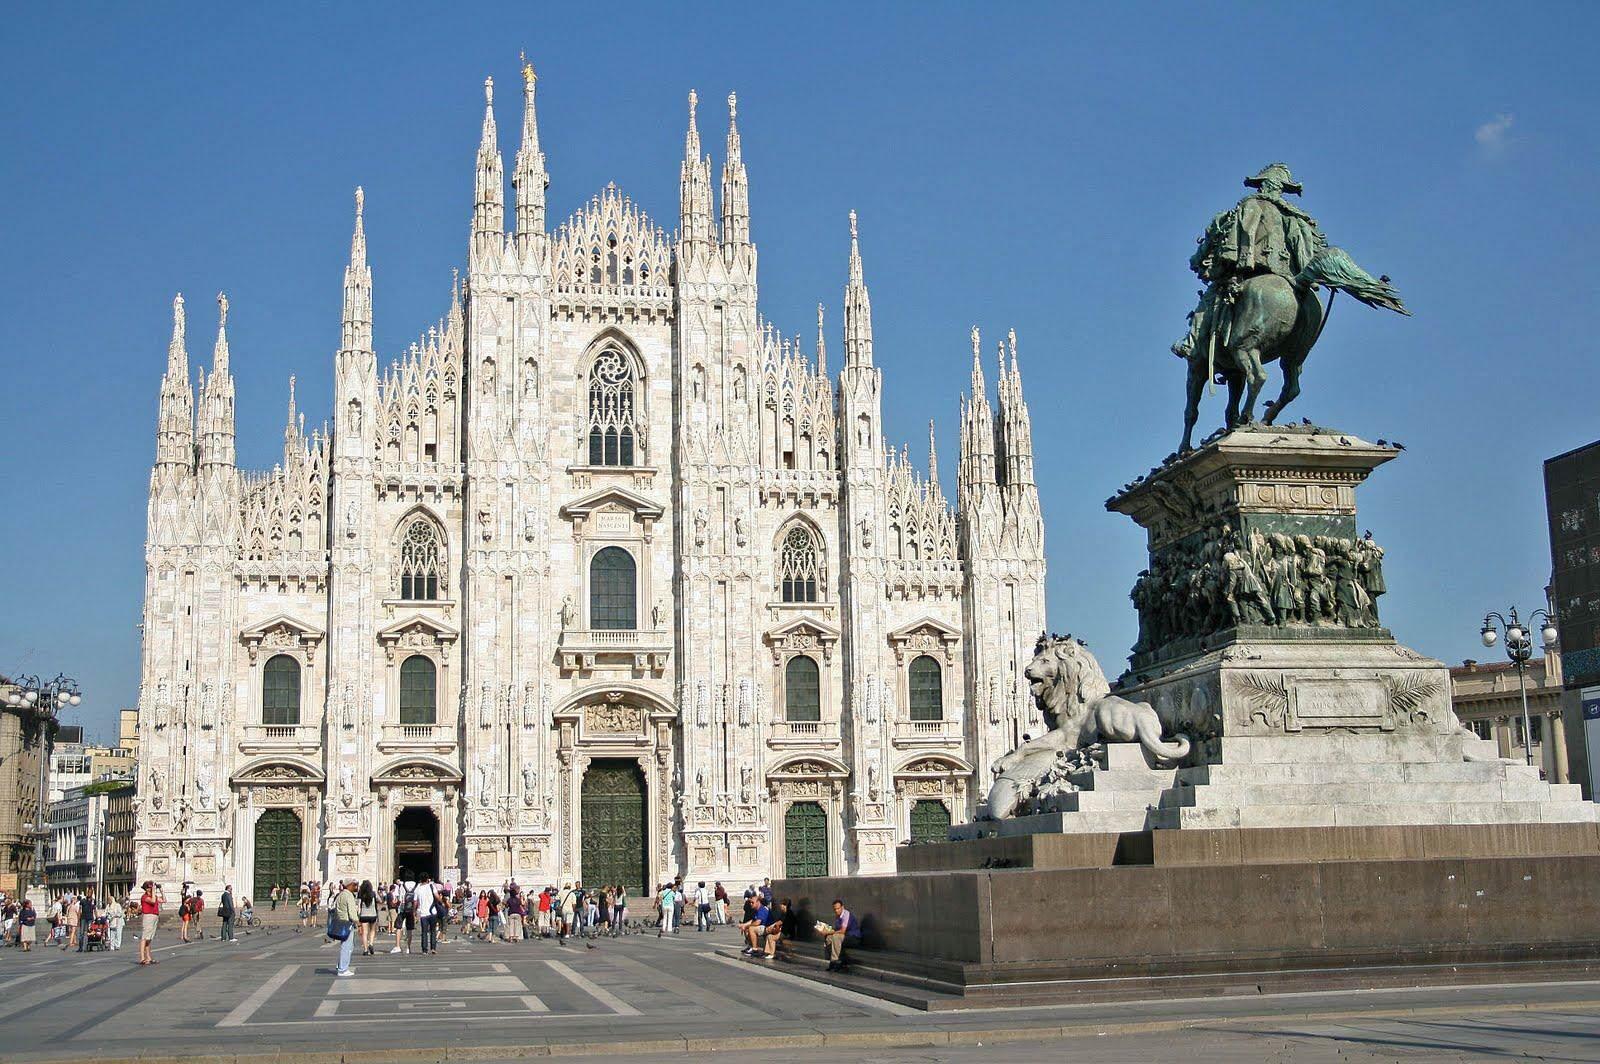 Duomo 4 dicas Viaje Global